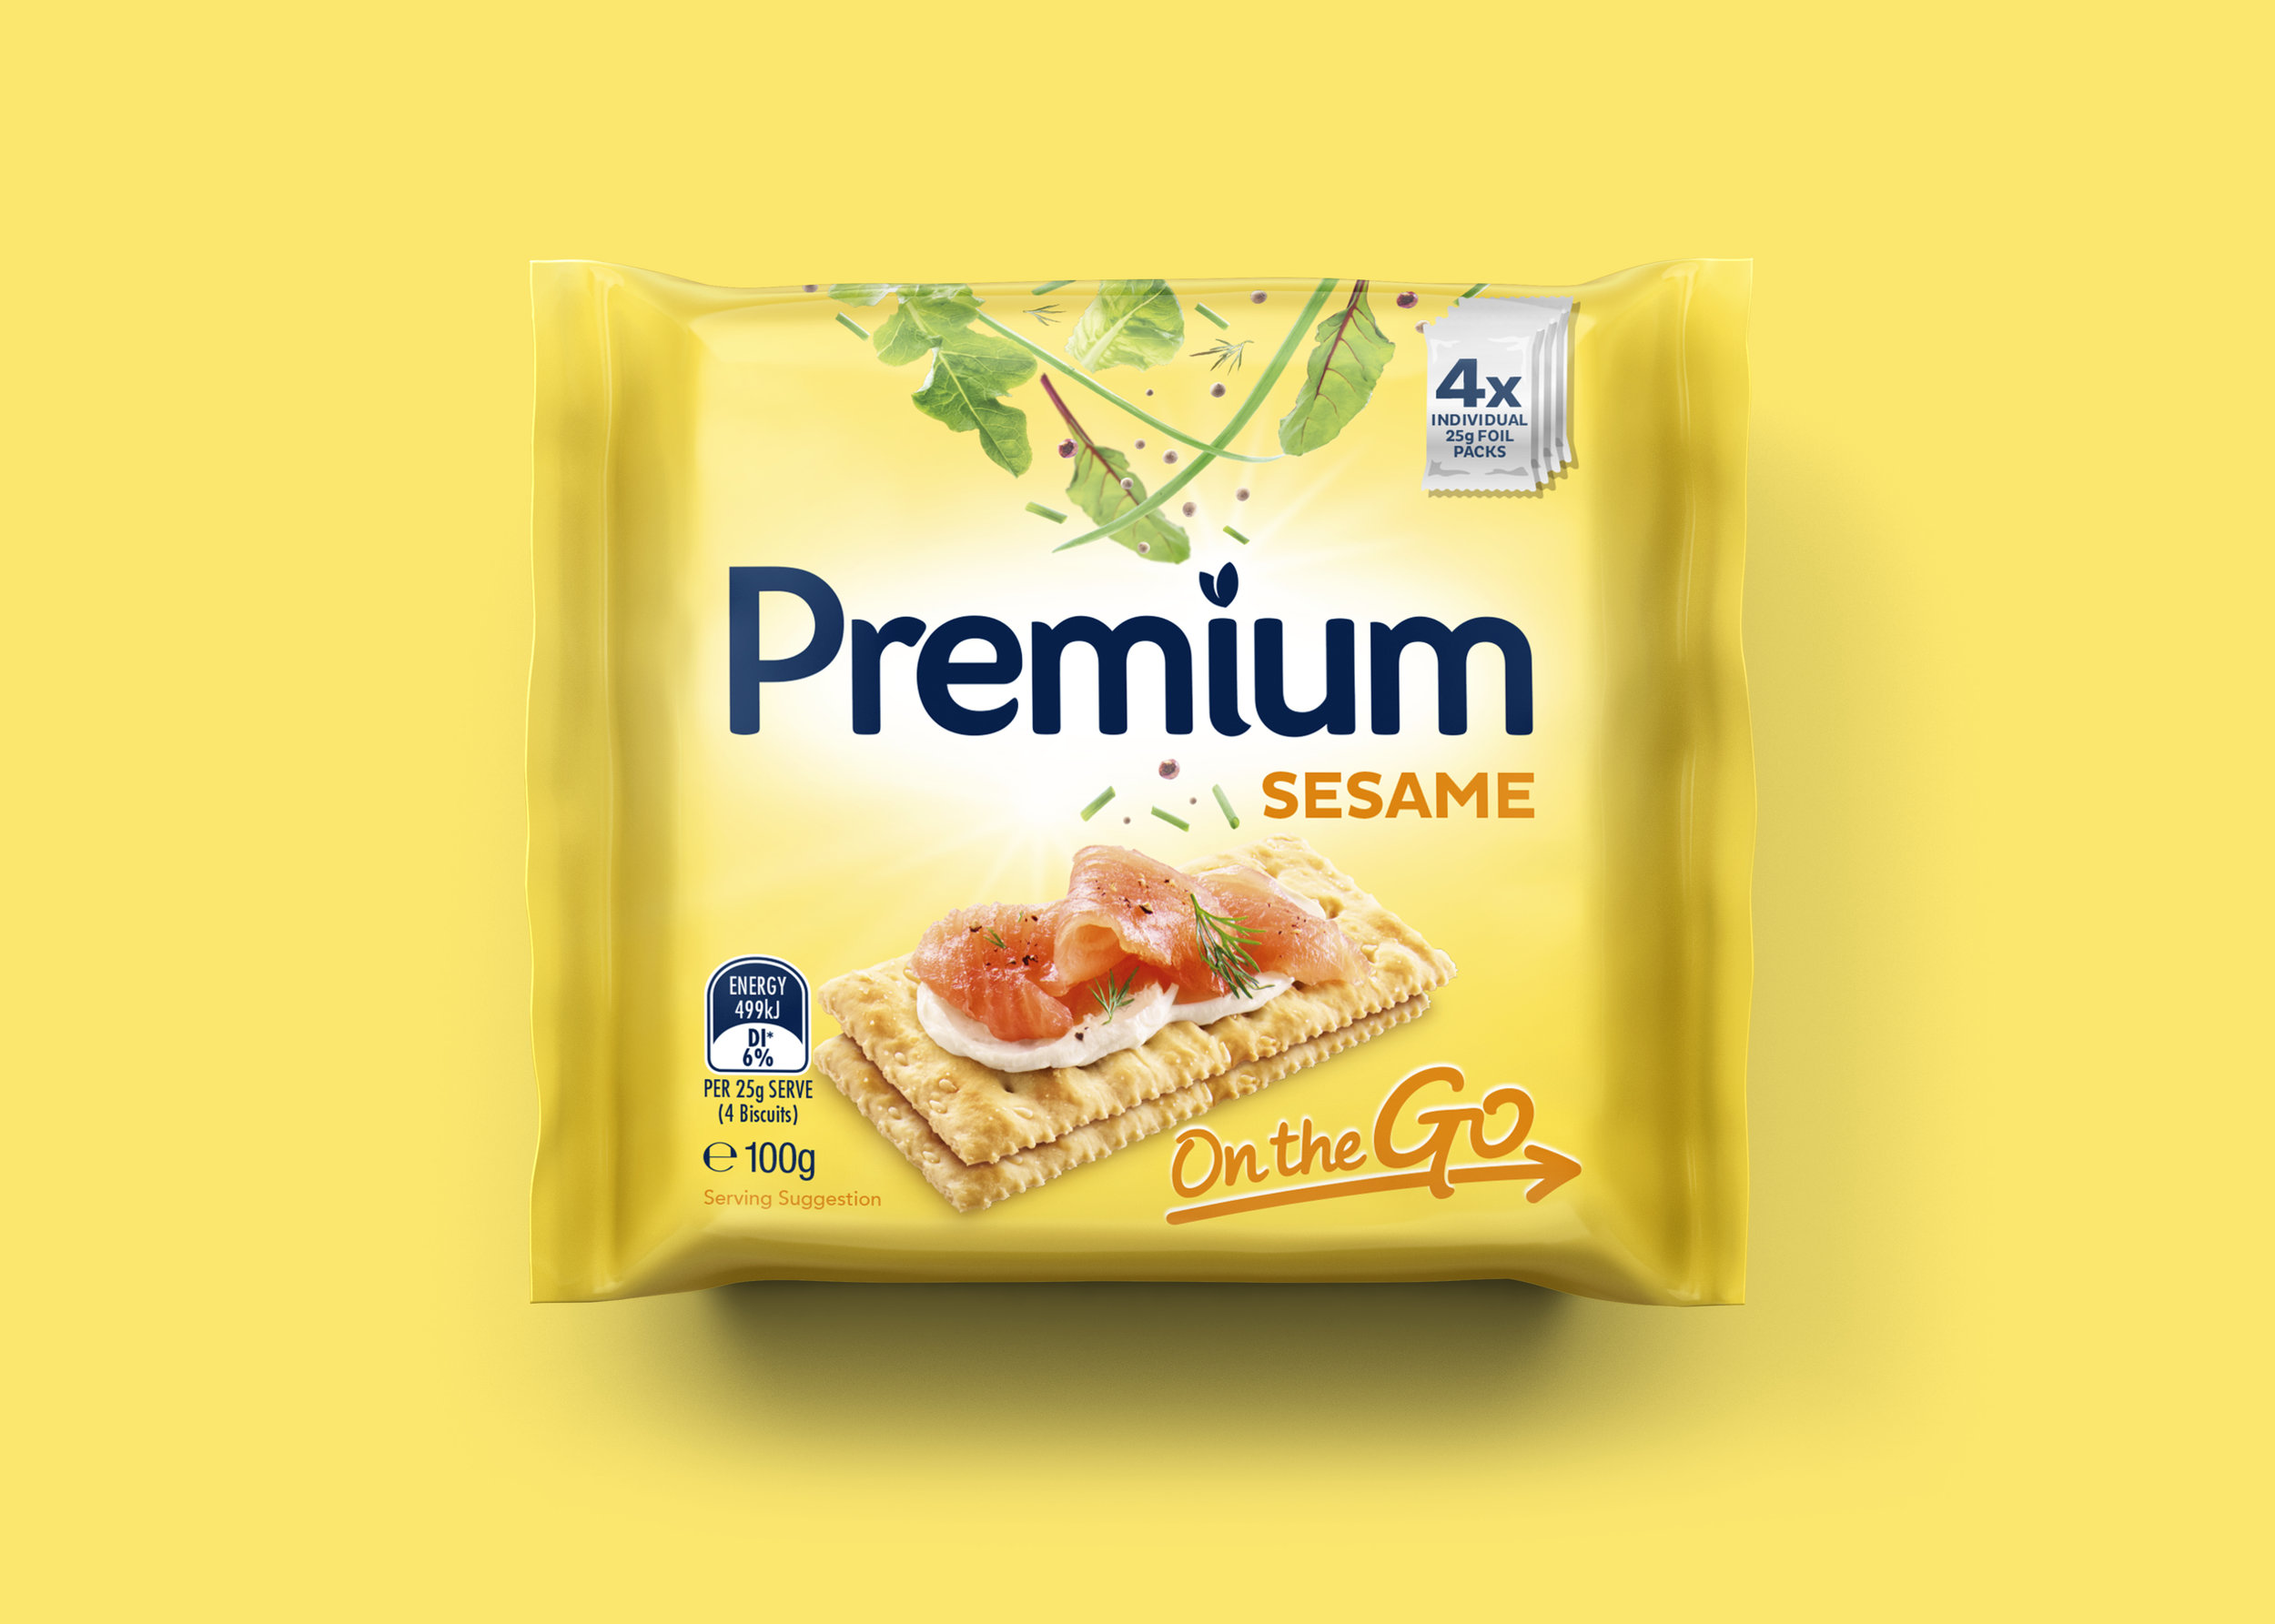 Premium_single_sesame_bg-yellow.jpg